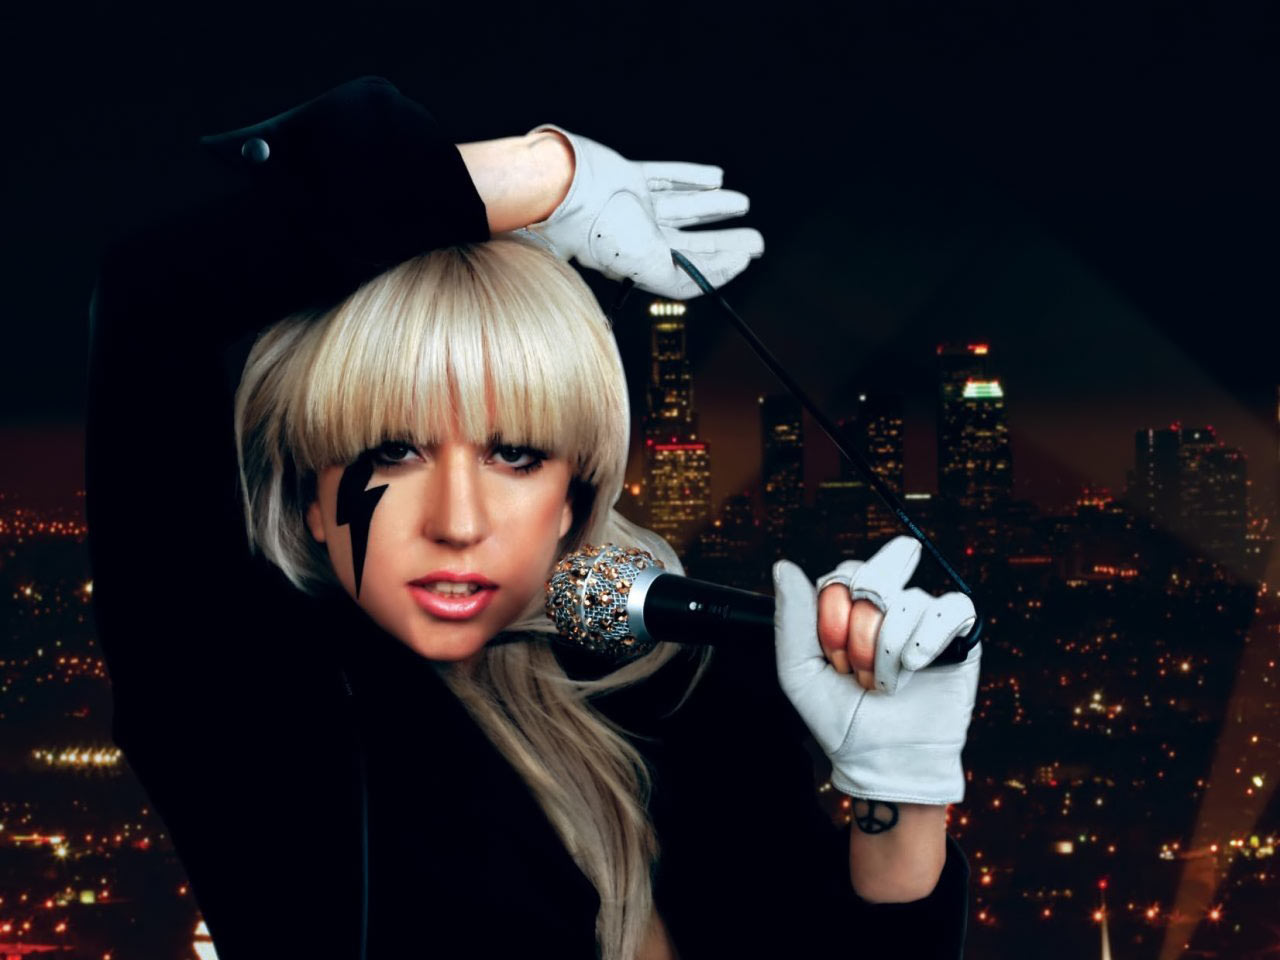 http://3.bp.blogspot.com/-lqg9uGATCRM/UBVxjukUoMI/AAAAAAAAAe4/5NeMrU0-mVA/s1600/Lady+Gaga+Phenomenon-top-celebrity2011.blogspot.com-lady-gaga-wallpaper.jpg